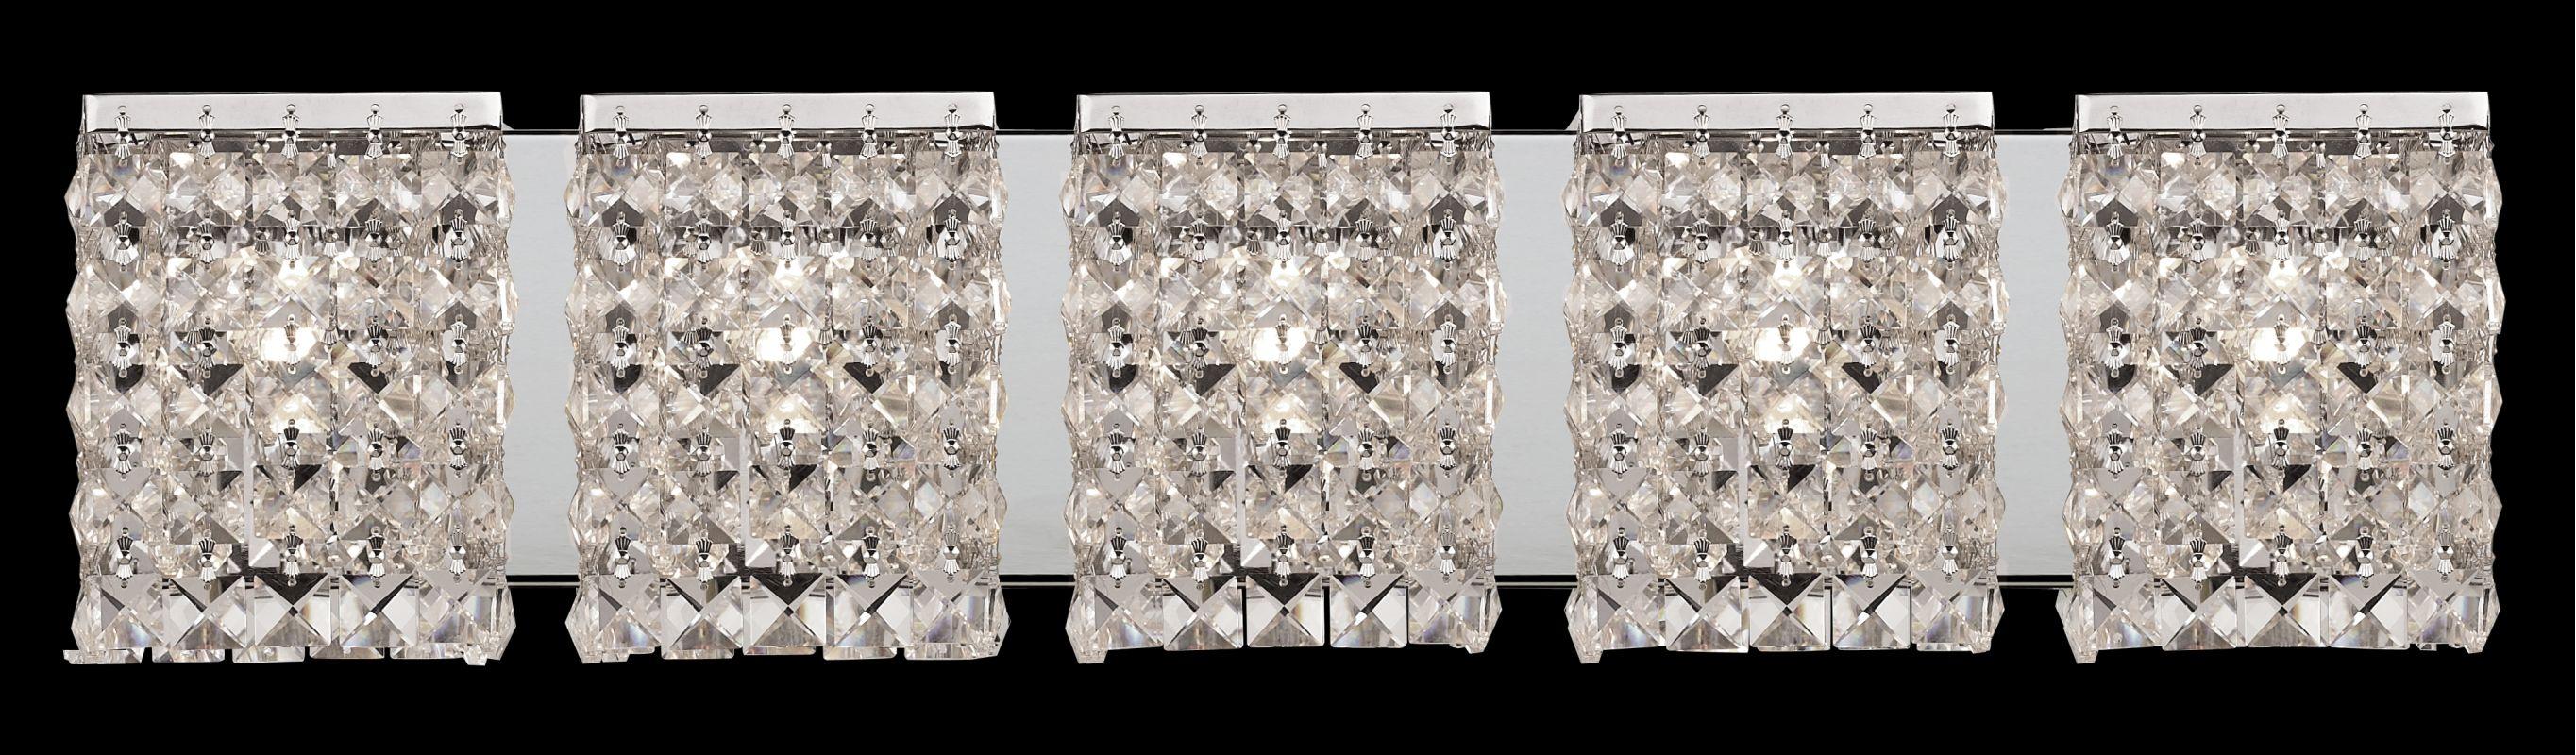 Z-Lite 184-5V Waltz 5 Light Bathroom Vanity Light with Crystal Shade Sale $664.00 ITEM: bci2219684 ID#:184-5V UPC: 685659023336 :